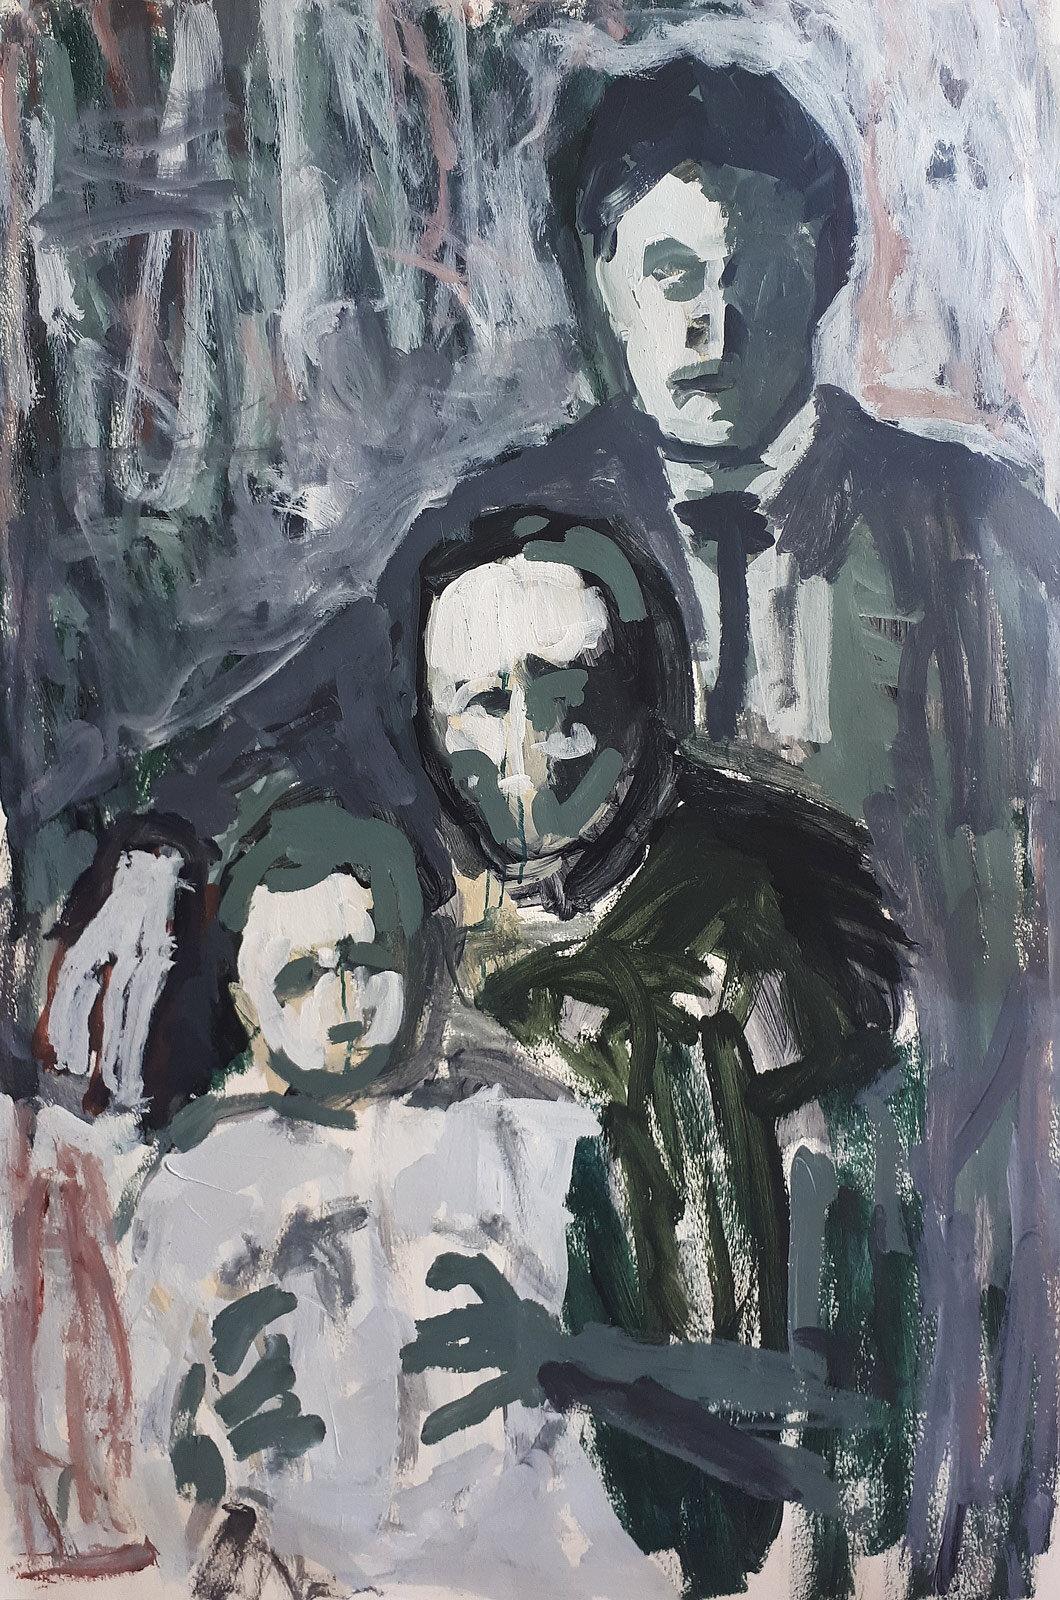 The Pasternak's (damaged portrait)   Acrylic on paper 100x70cm  2019